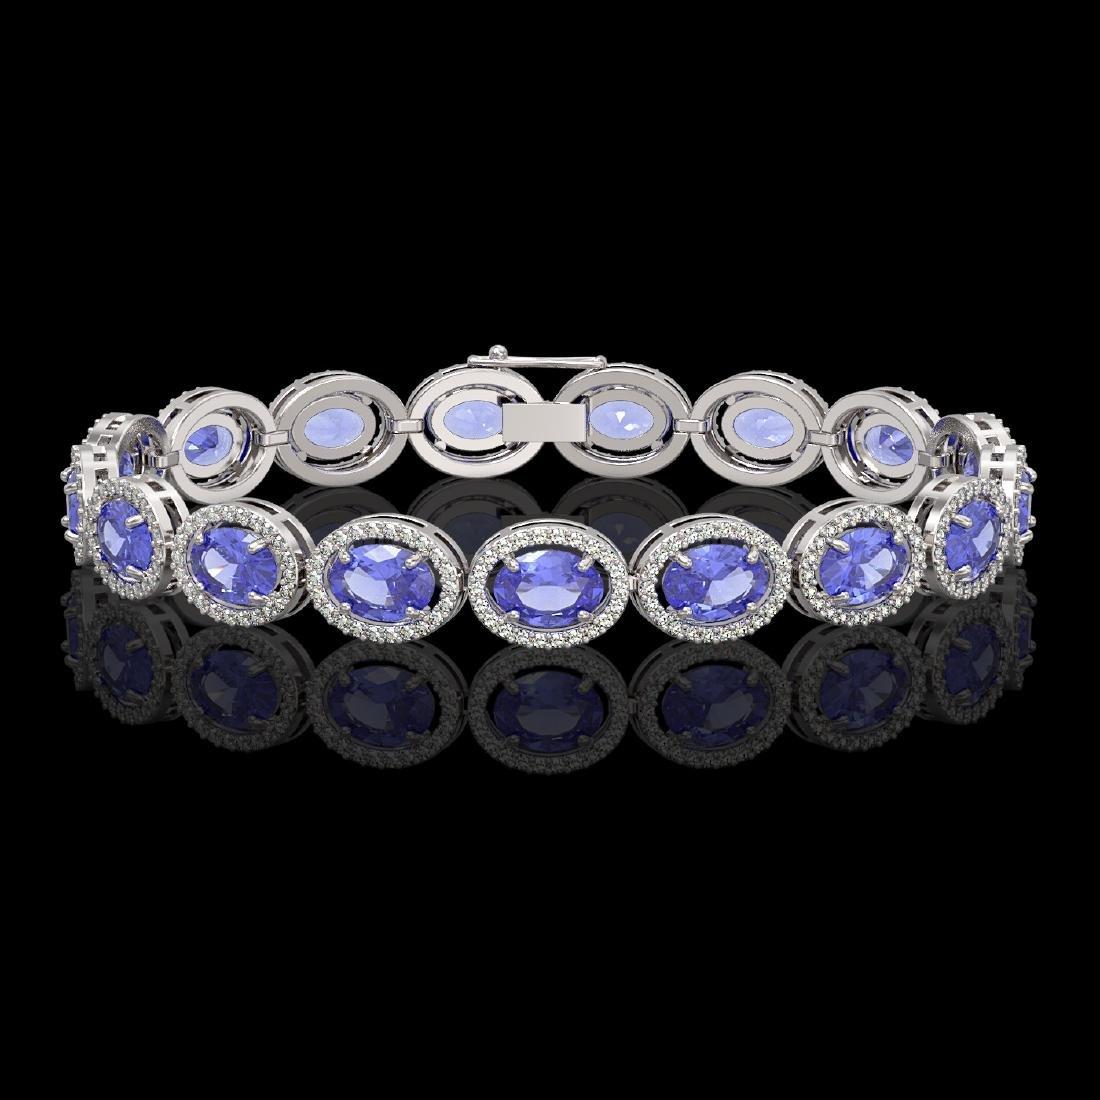 21.35 CTW Tanzanite & Diamond Halo Bracelet 10K White